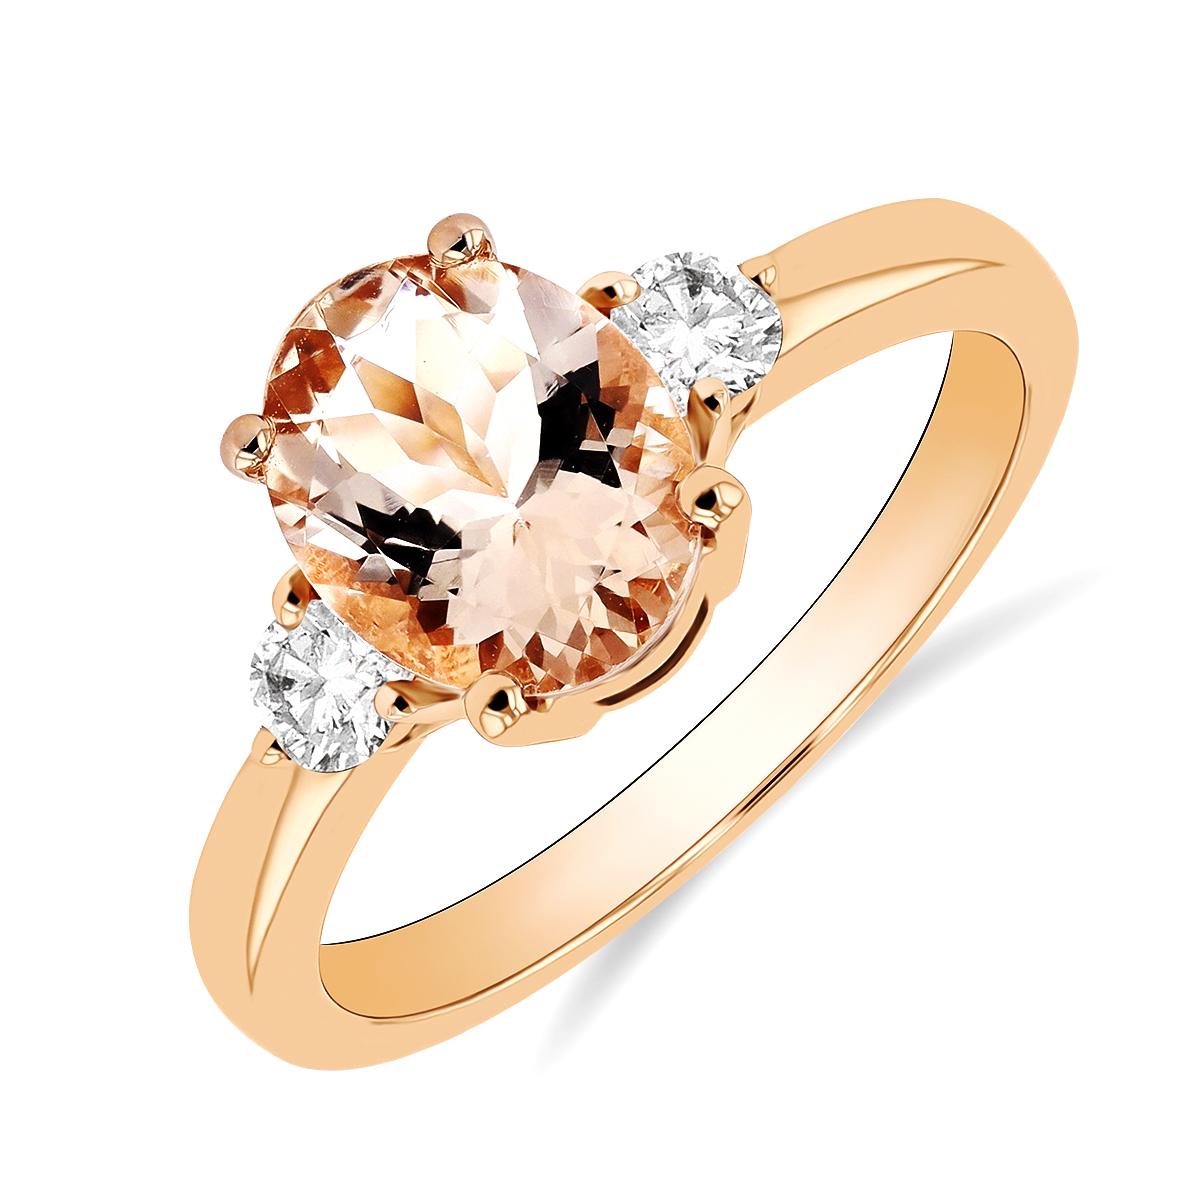 Rosa Mer Collection 1.71ct Morganite & Diamond Ring | 18K Rose Gold